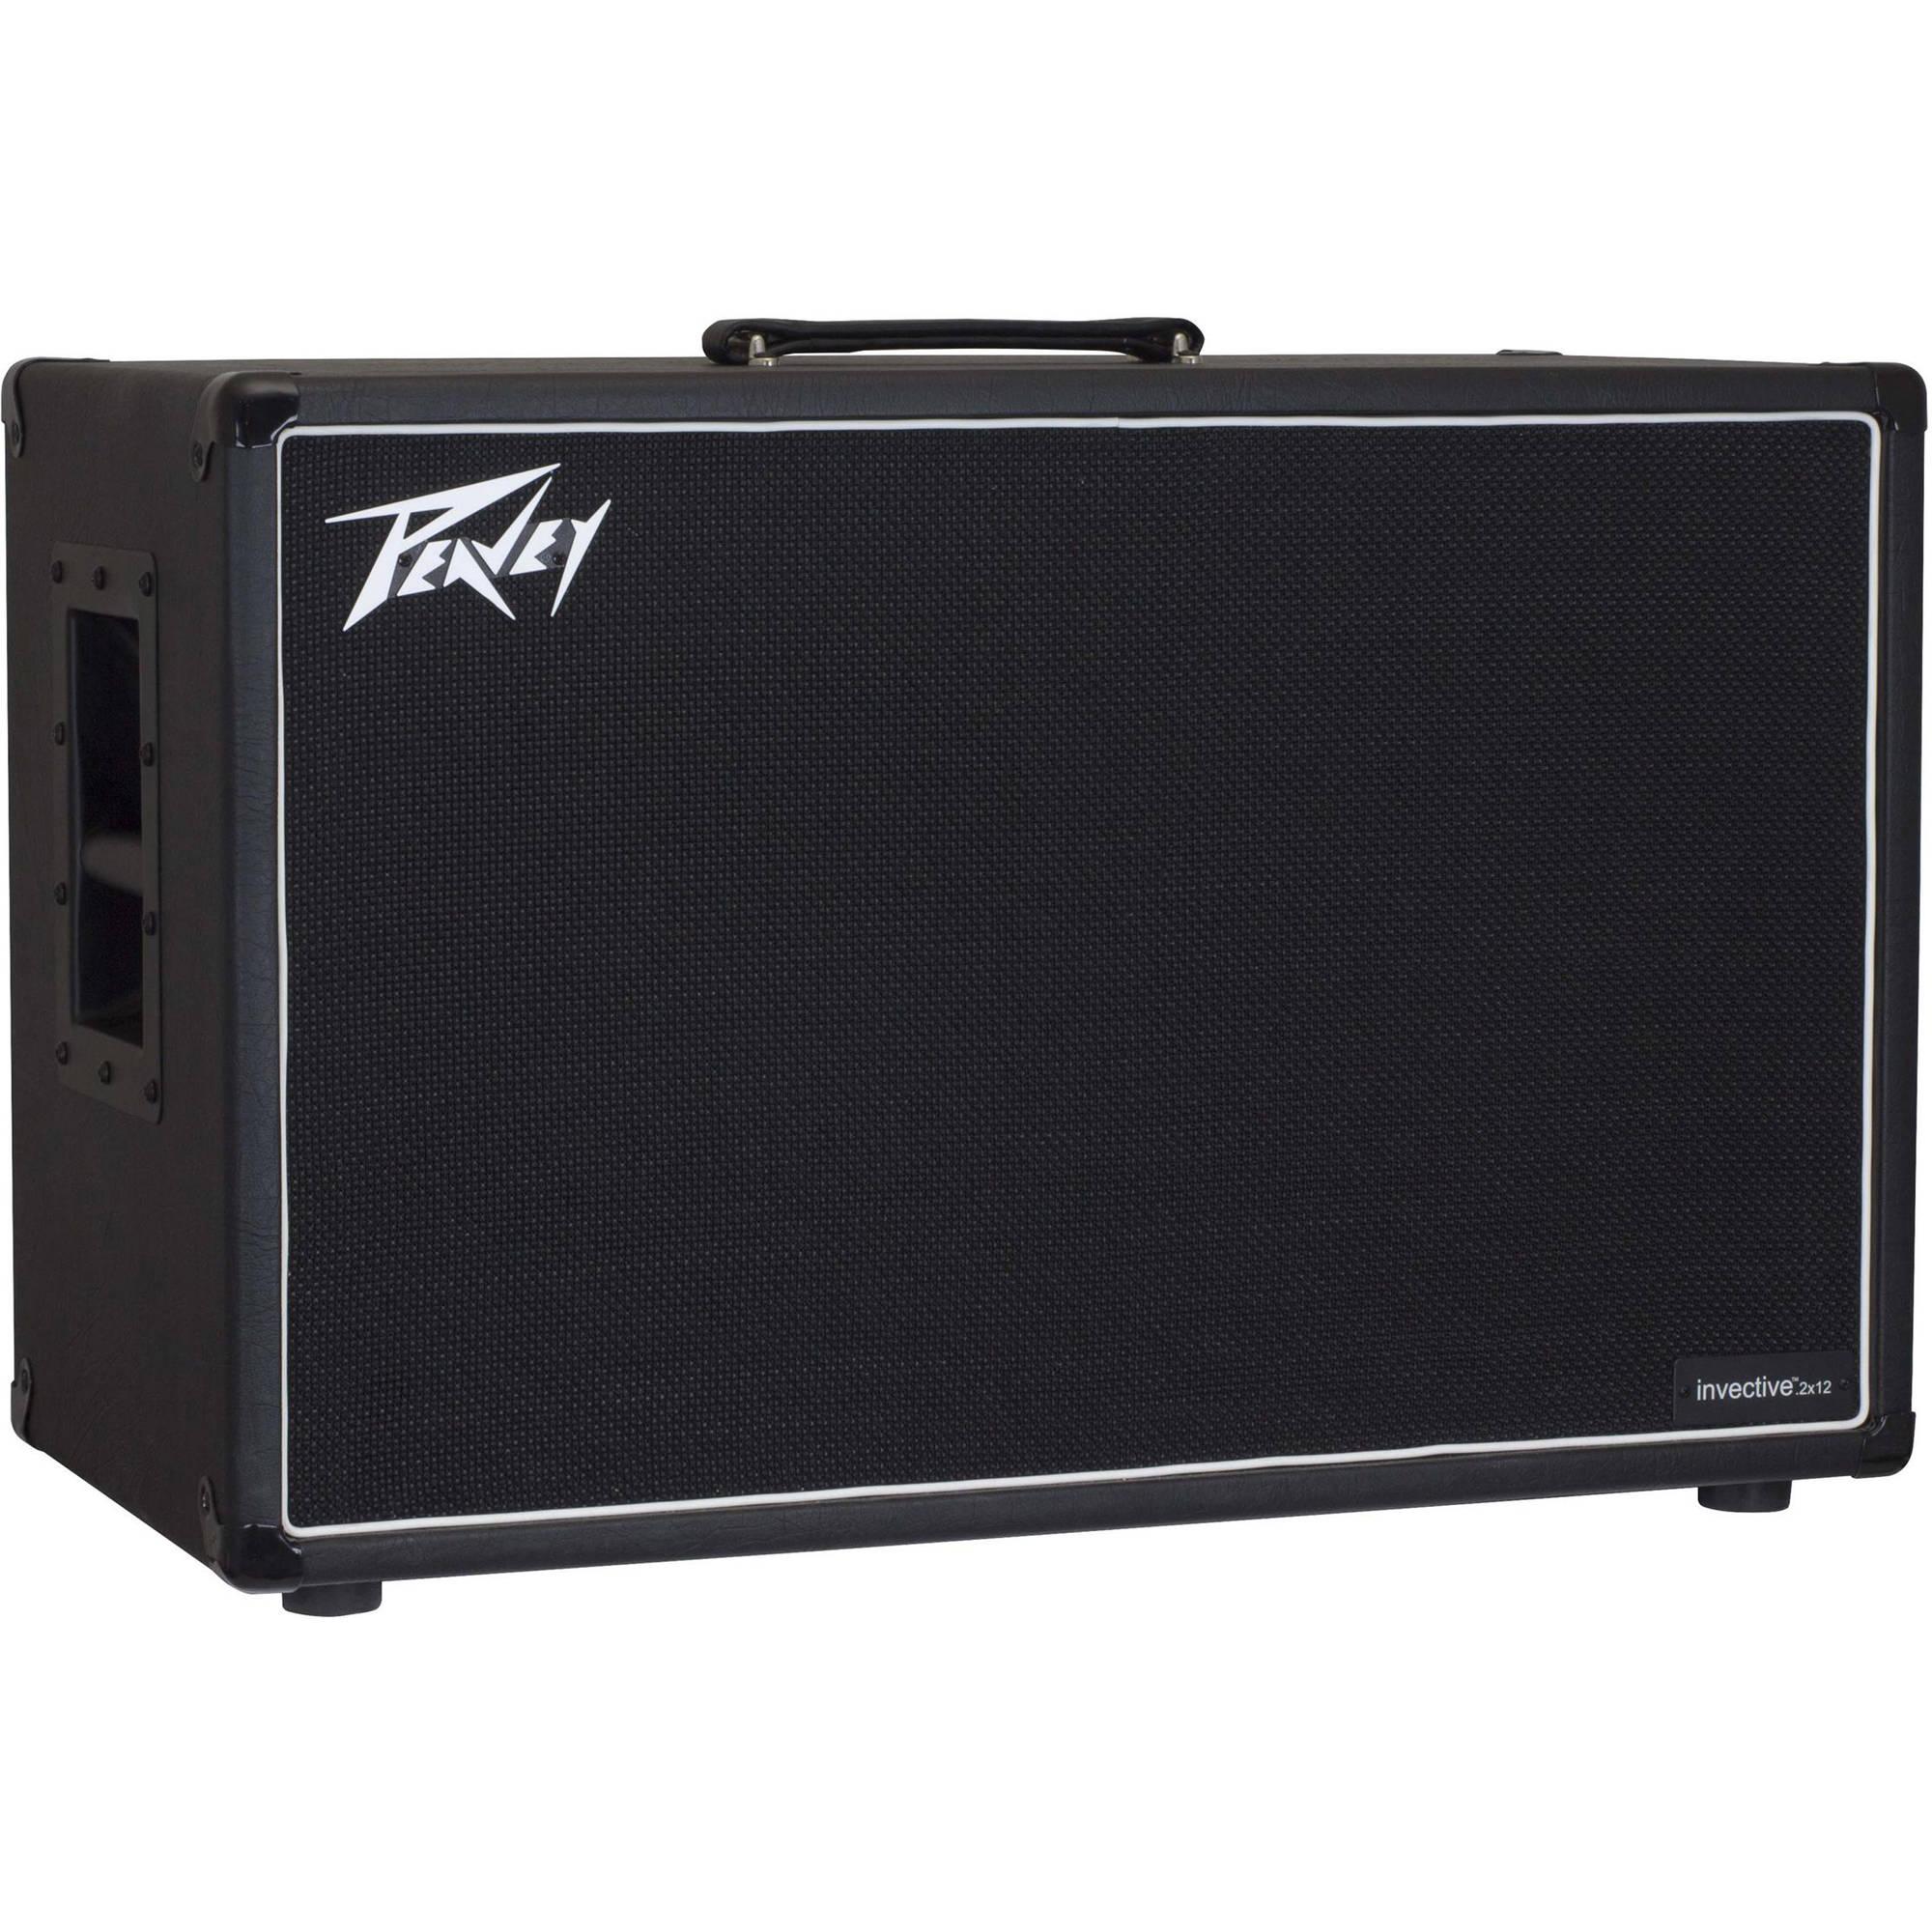 peavey invective 212 guitar cabinet 03616670 b h photo video. Black Bedroom Furniture Sets. Home Design Ideas